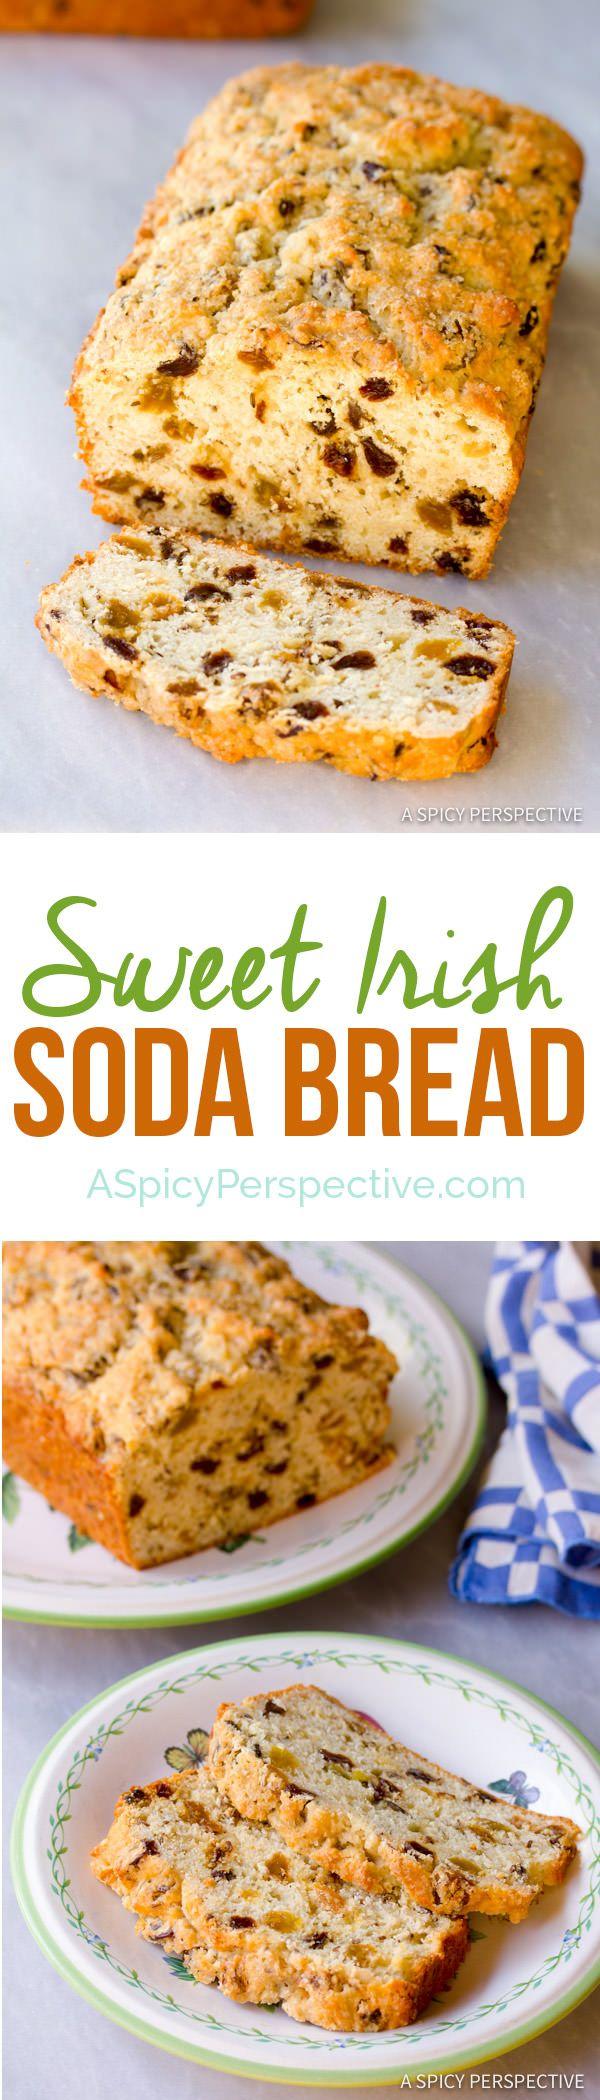 Sweet Irish Soda Bread | ASpicyPerspective.com